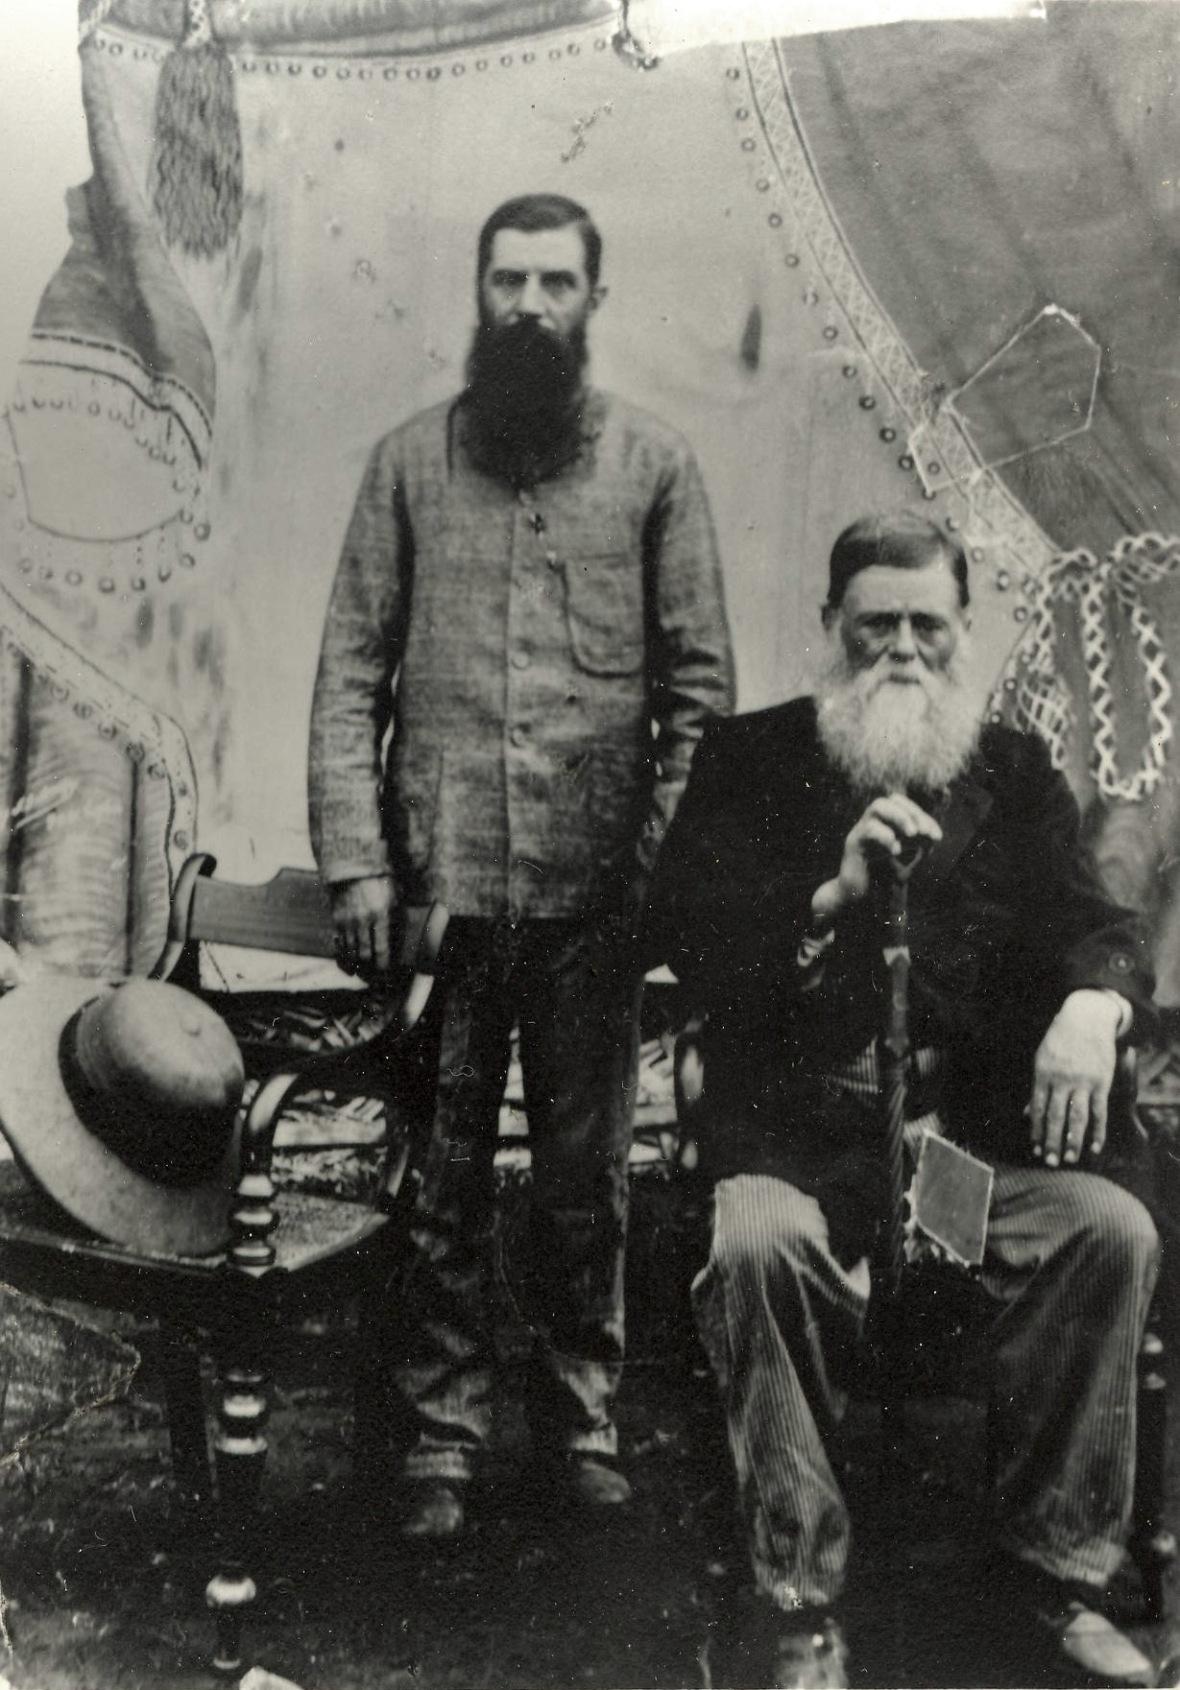 Maarten_Kruger_en_sy_seun_Louw,_Boerekrygsgevangenes_op_Ceylon,_1901.jpg